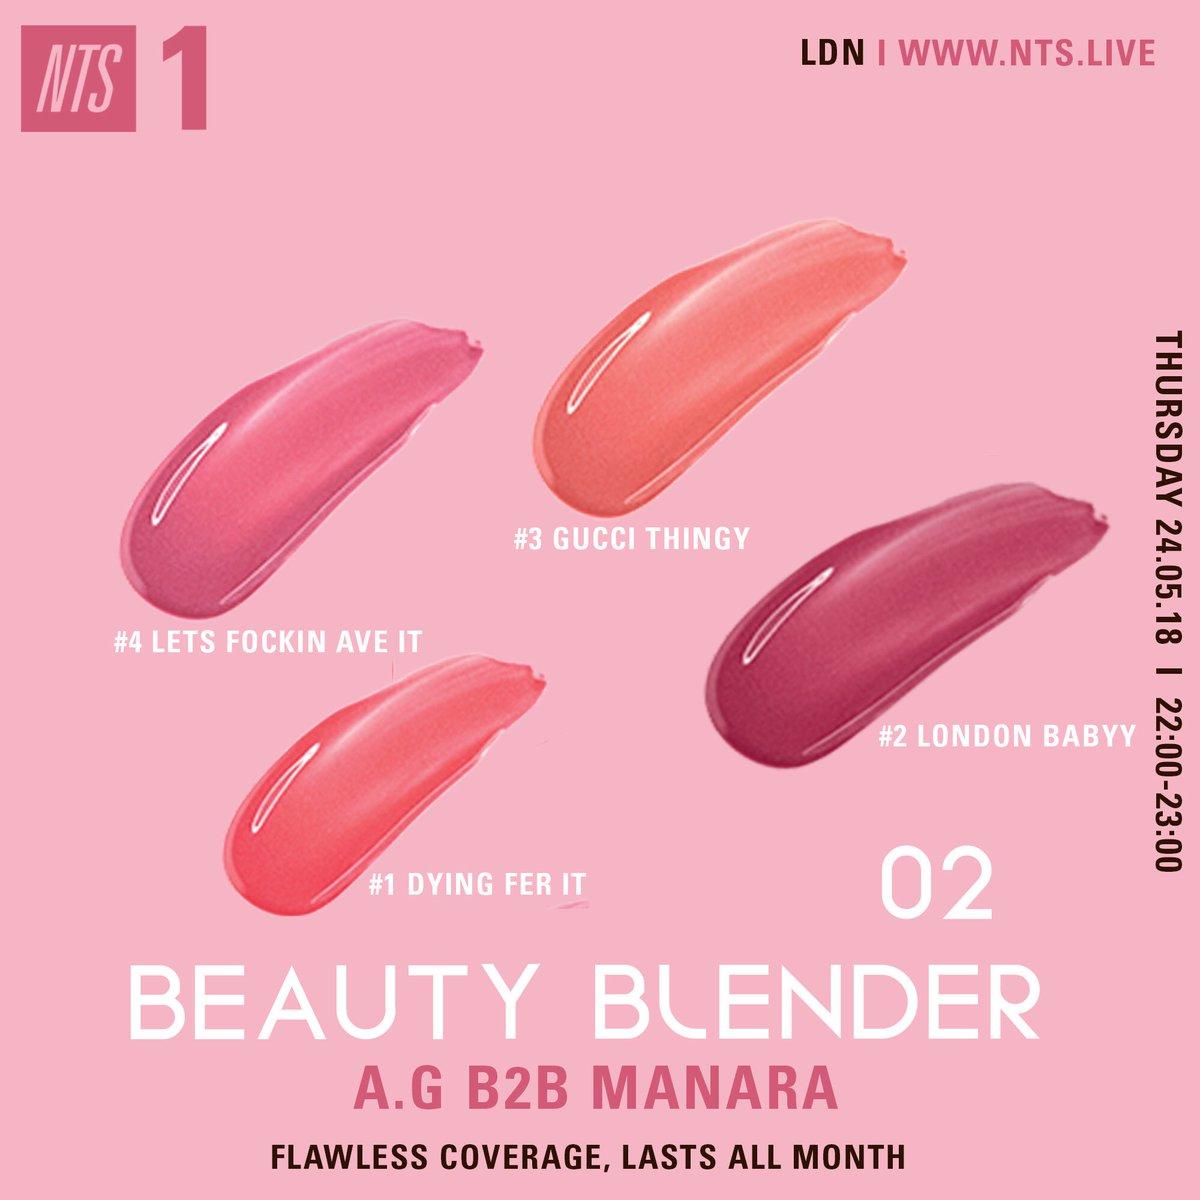 02: BEAUTY BLENDER   (A.G B2B @MANARAxx )  10PM tonight on @NTSlive<br>http://pic.twitter.com/6KaQxlWLe7